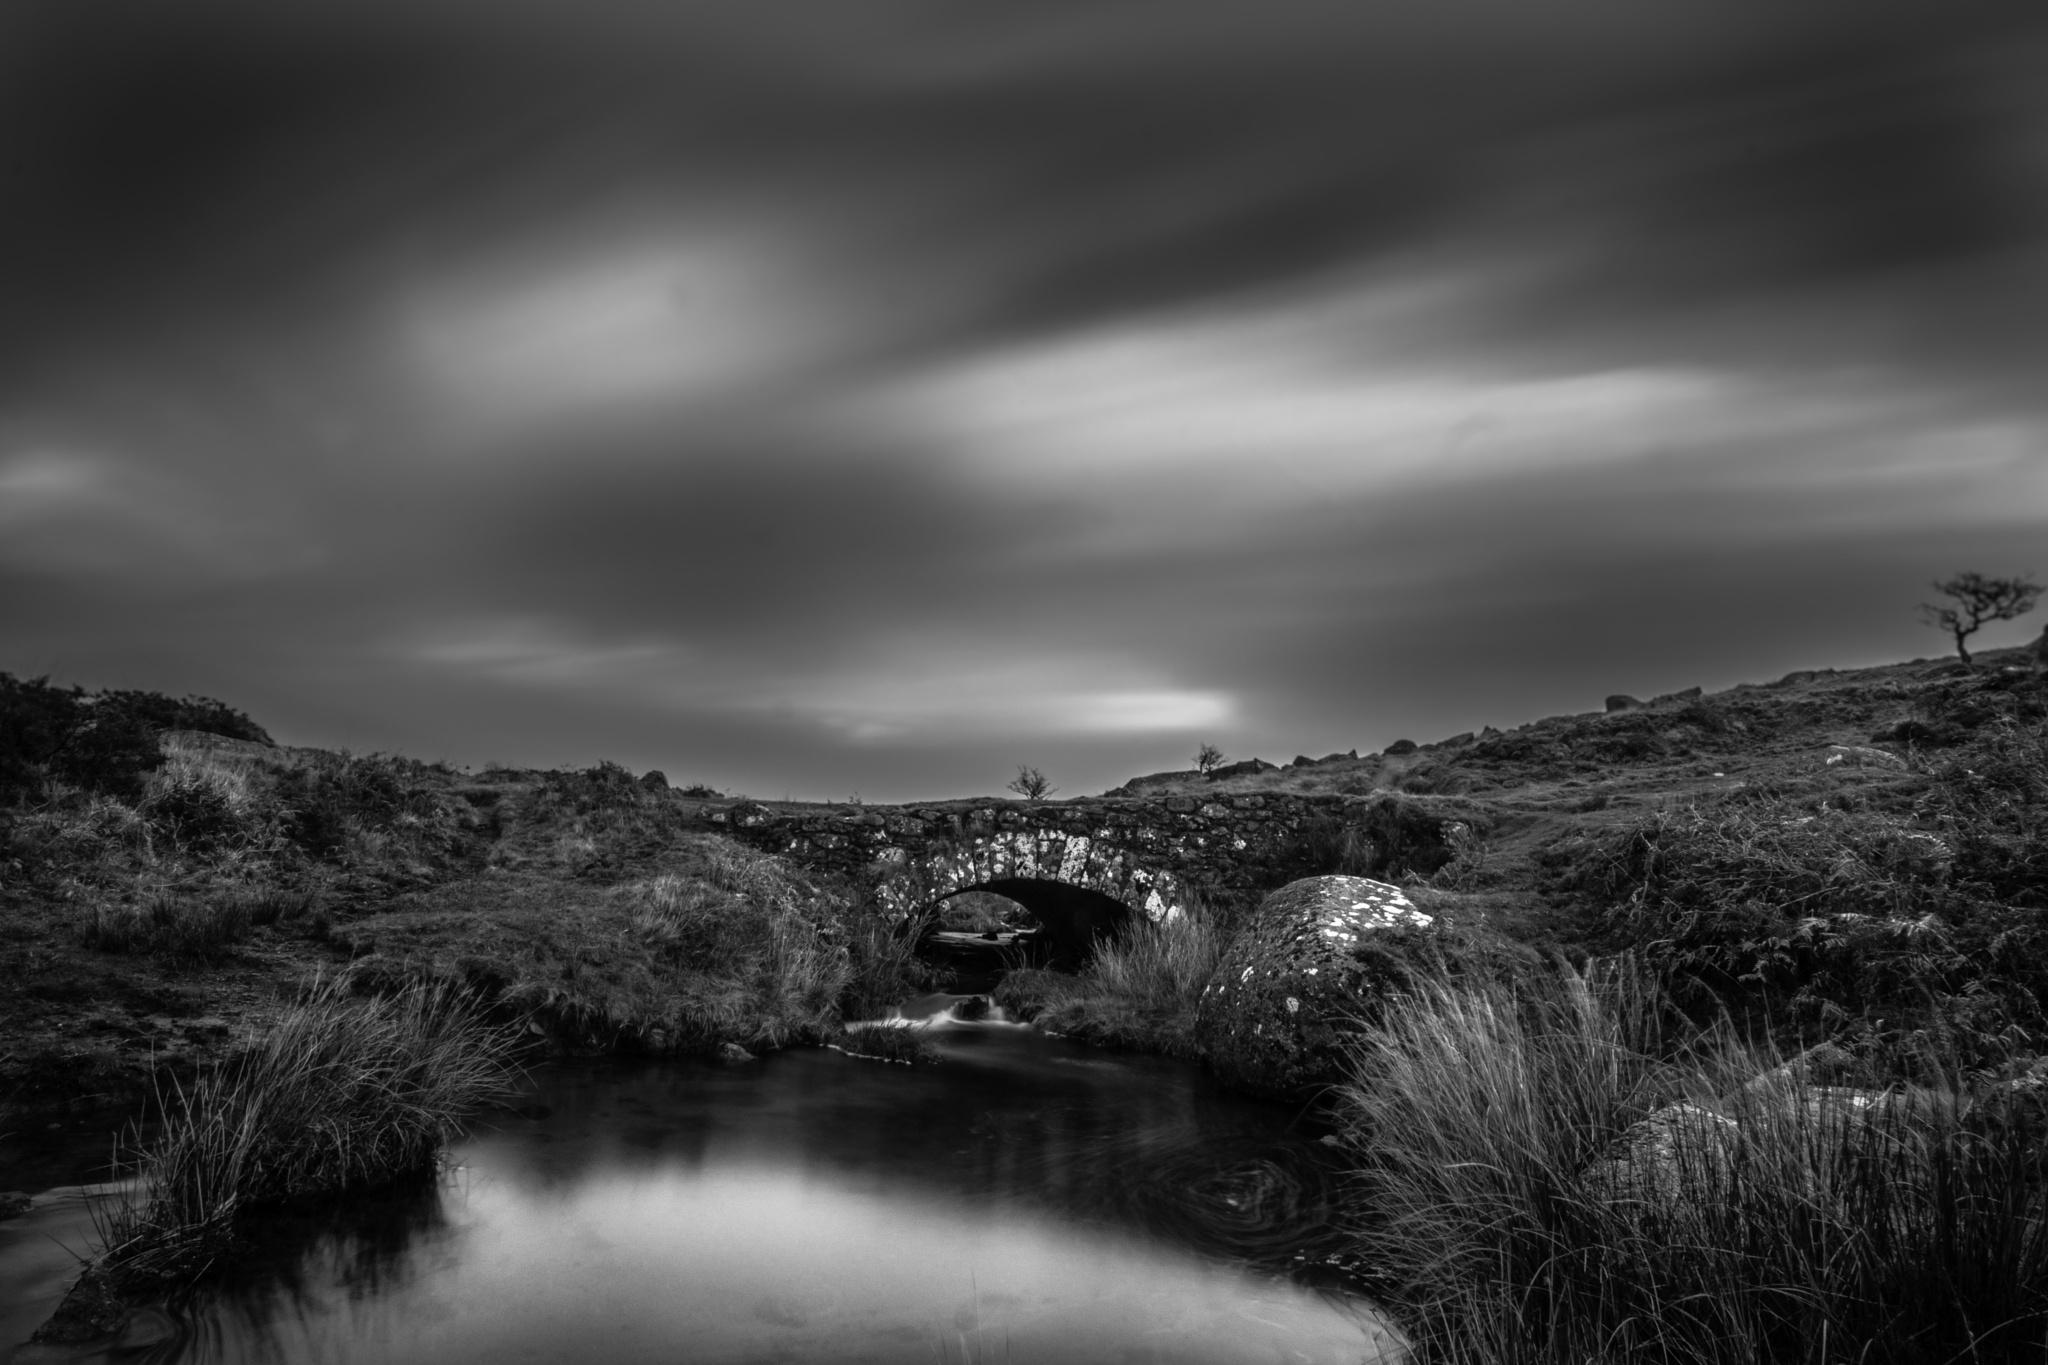 dartmoor bleak stream by phillip ticehurst